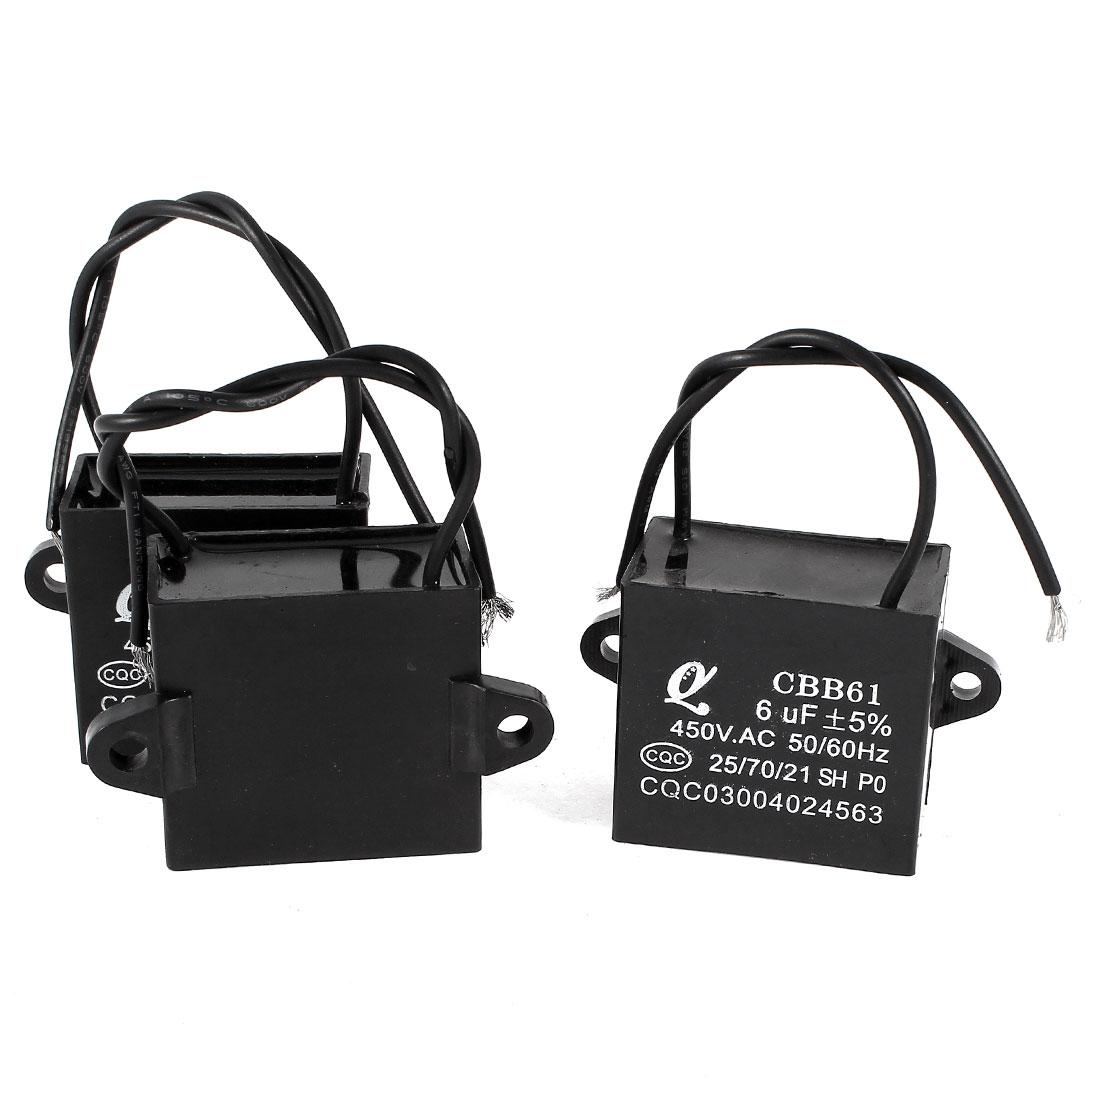 AC 450V 6uF 5% 2 Wired Metalized Polypropylene Film Motor Capacitor Black 3 Pcs